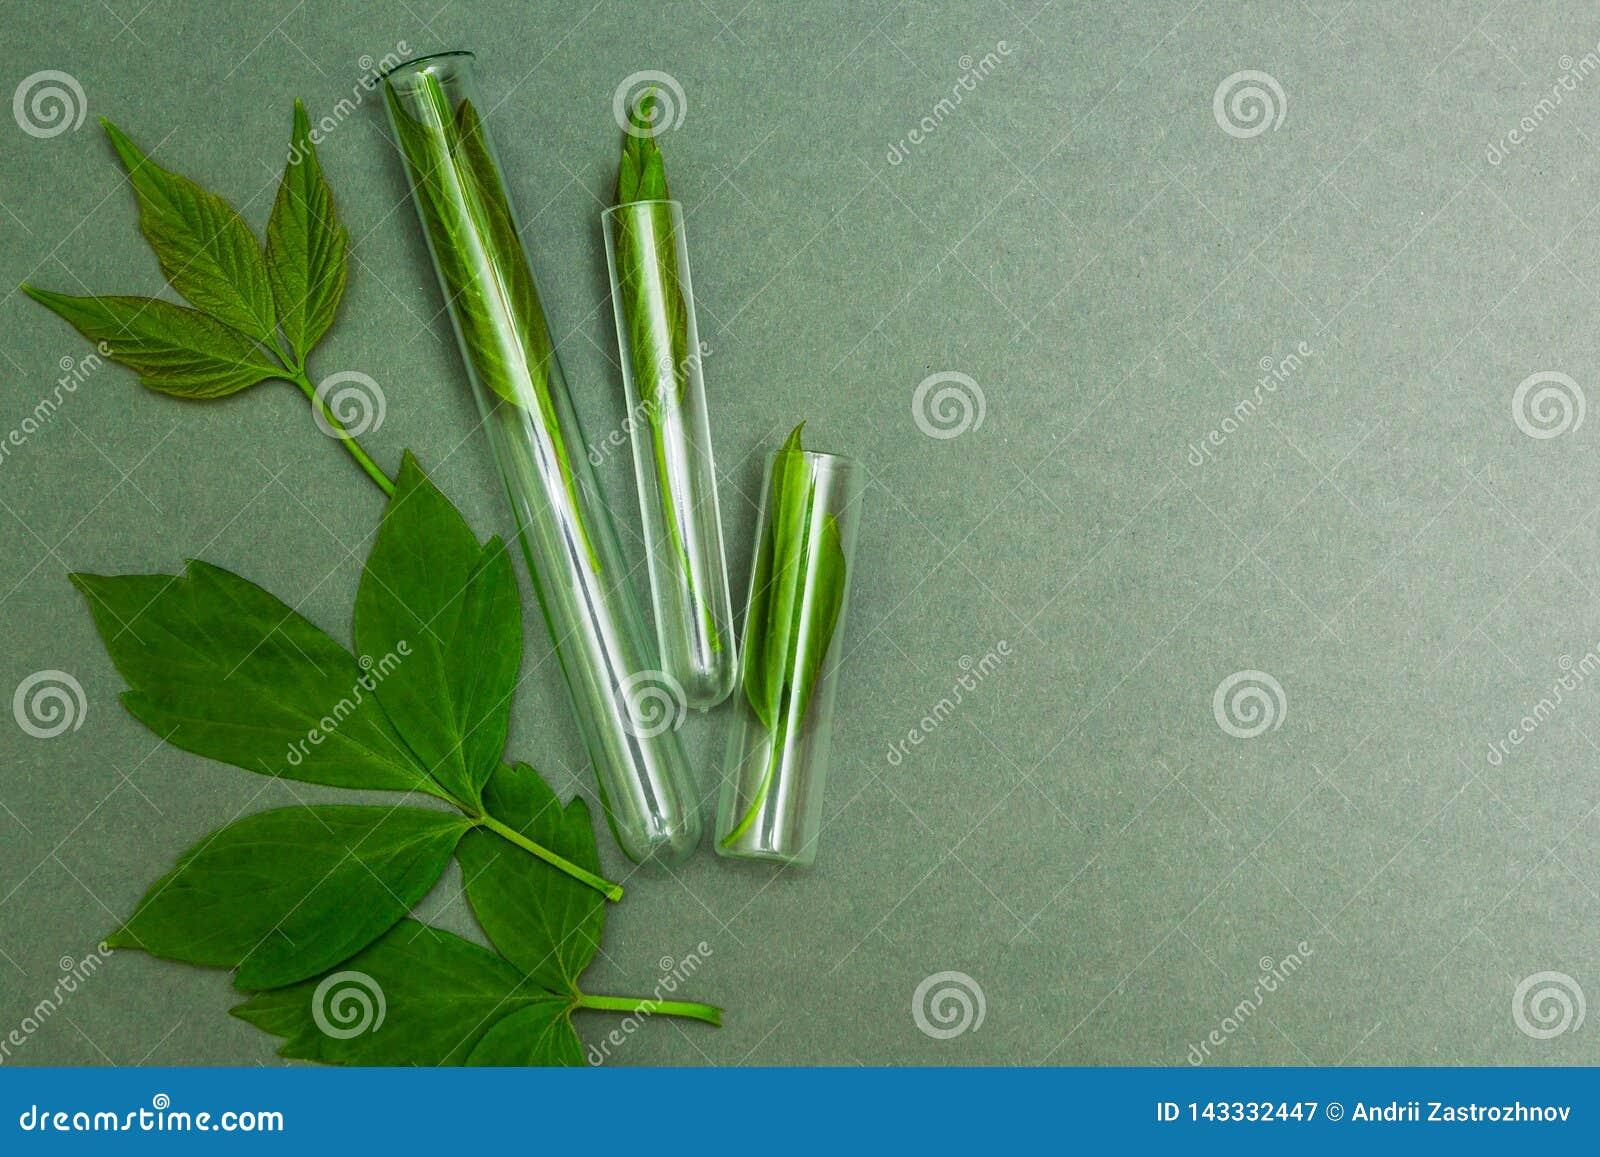 Foglie verdi in tubi, vista superiore Omeopatia, spazio per testo